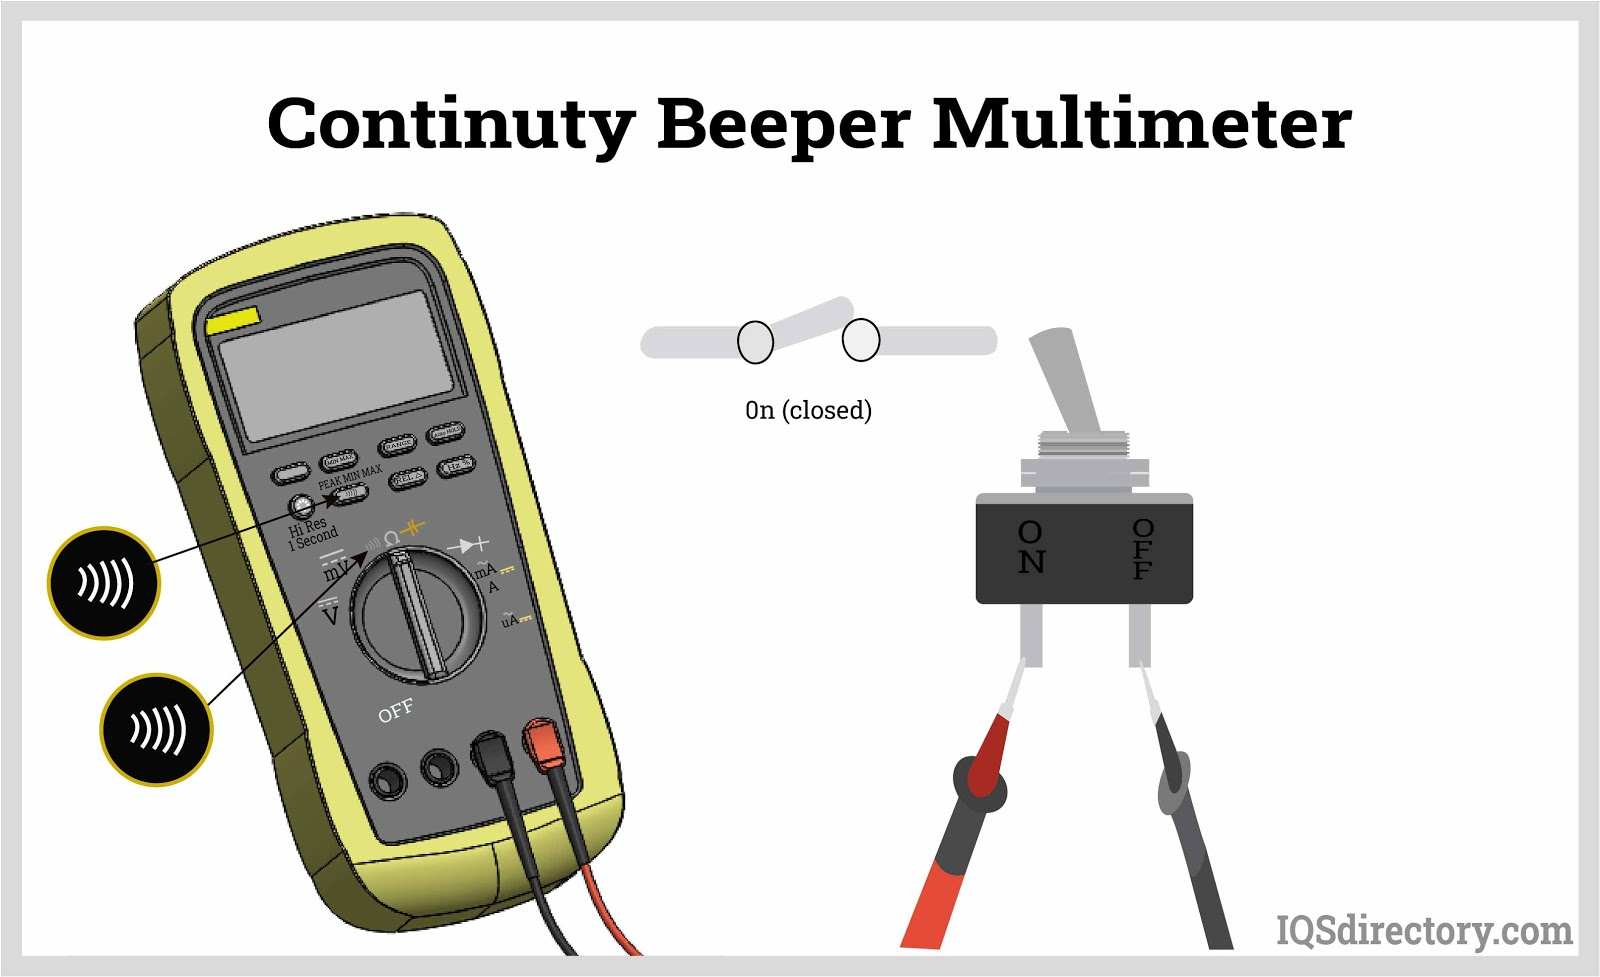 Continuity Beeper Multimeter